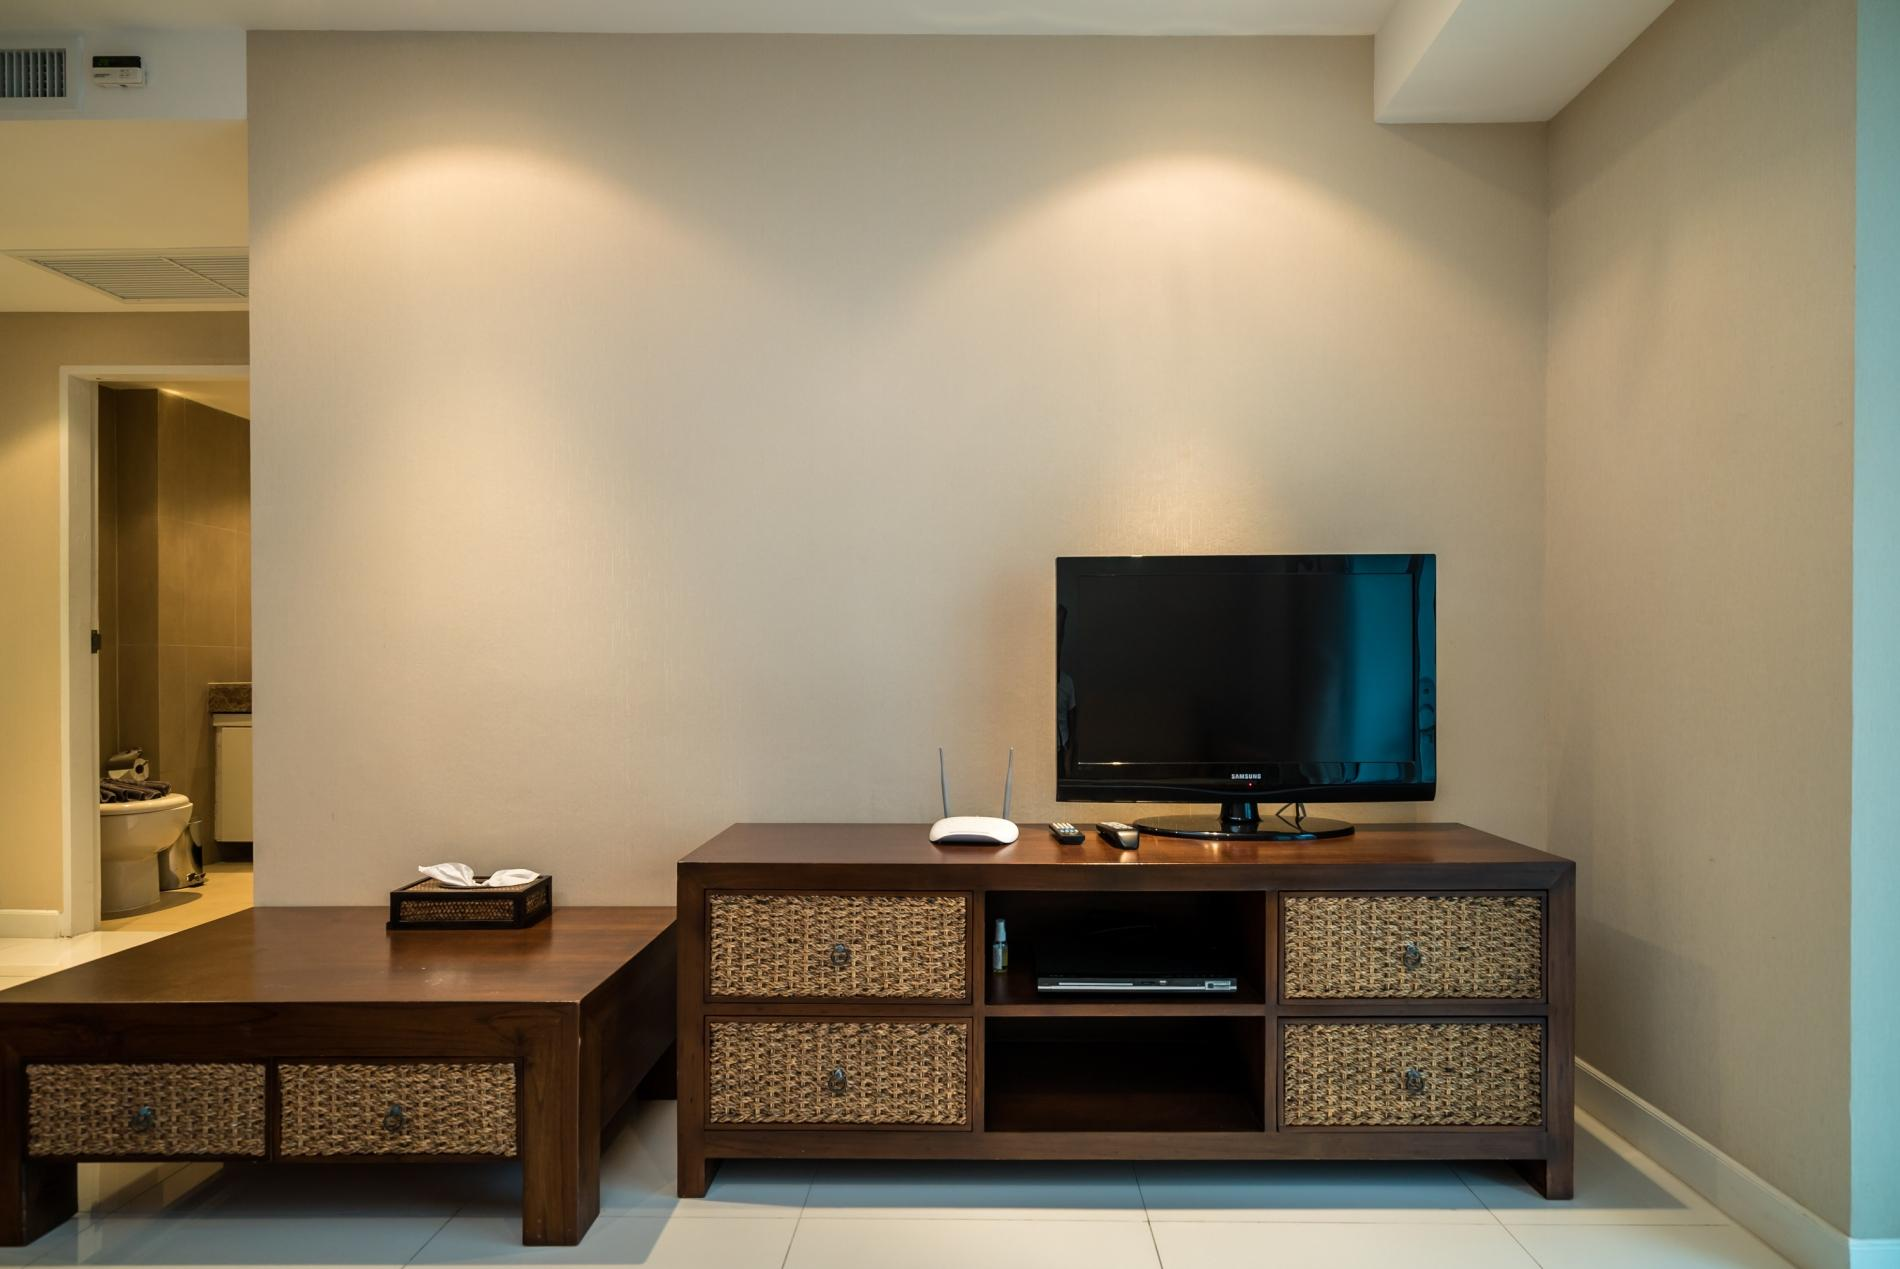 Apartment Kata Ocean View condominium - 1 bdr mountain view apartment photo 20390578